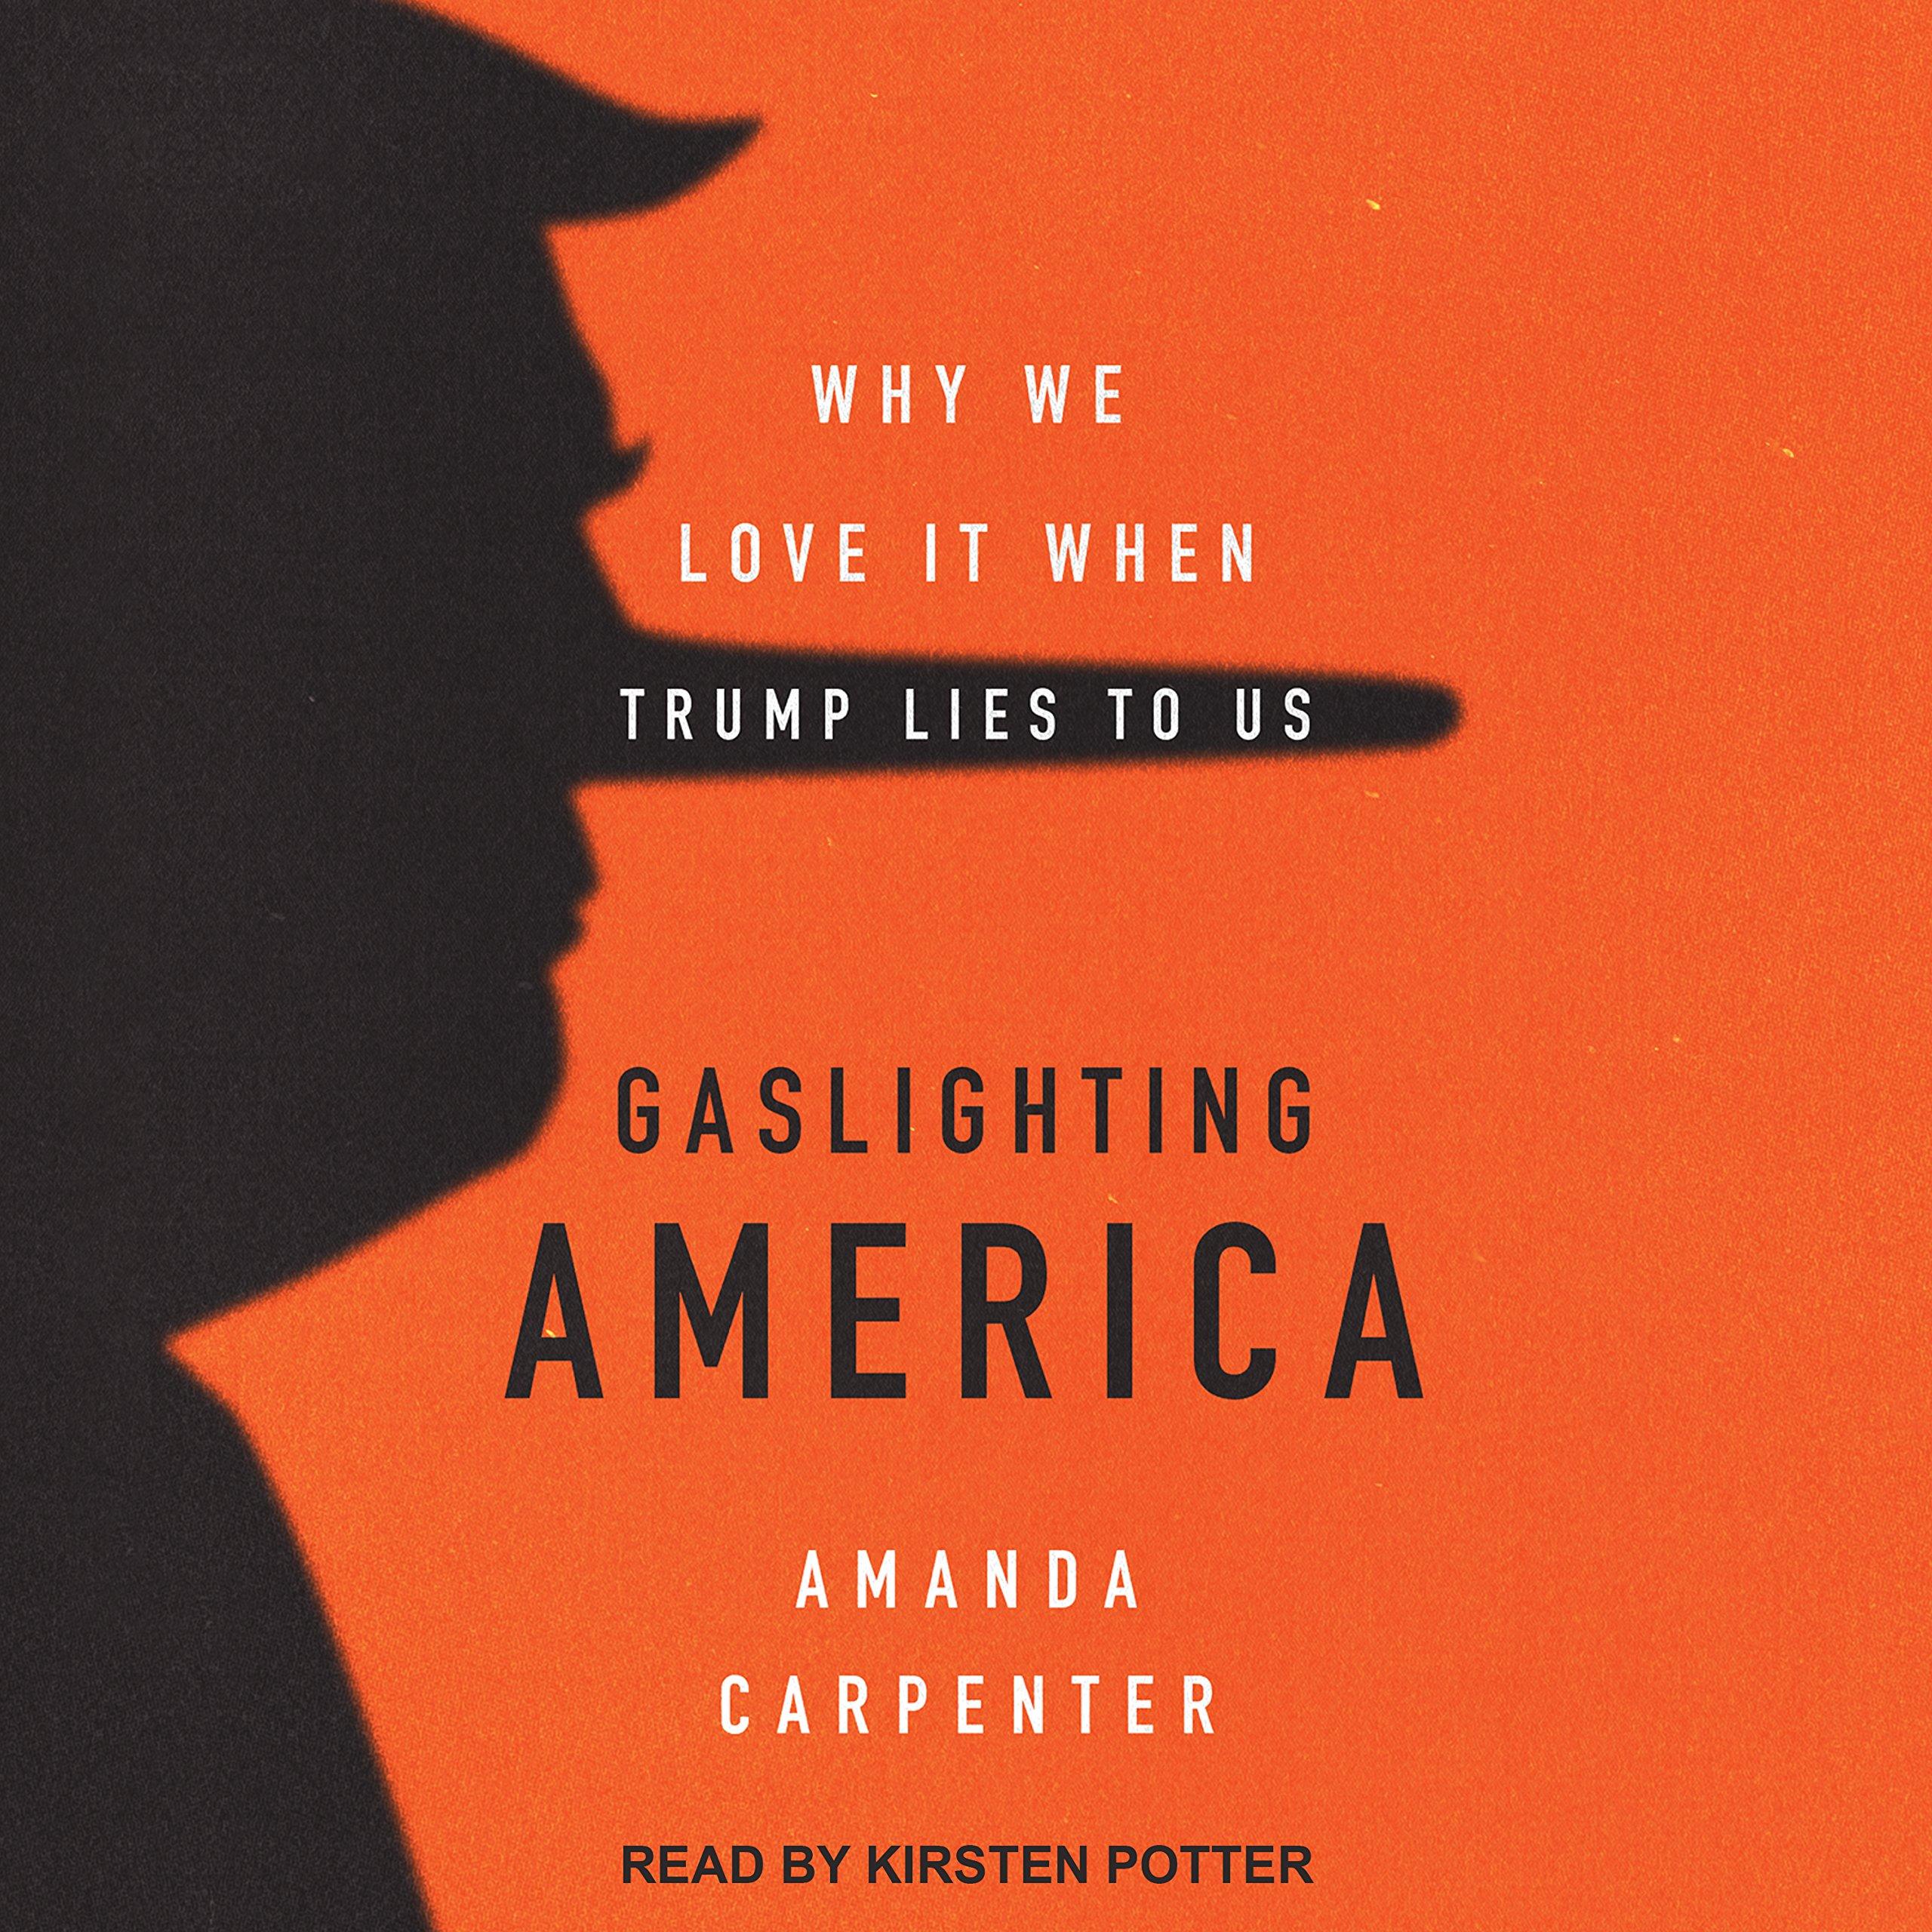 Gaslighting America: Why We Love It When Trump Lies to Us: Amazon.es: Amanda B. Carpenter, Kirsten Potter: Libros en idiomas extranjeros